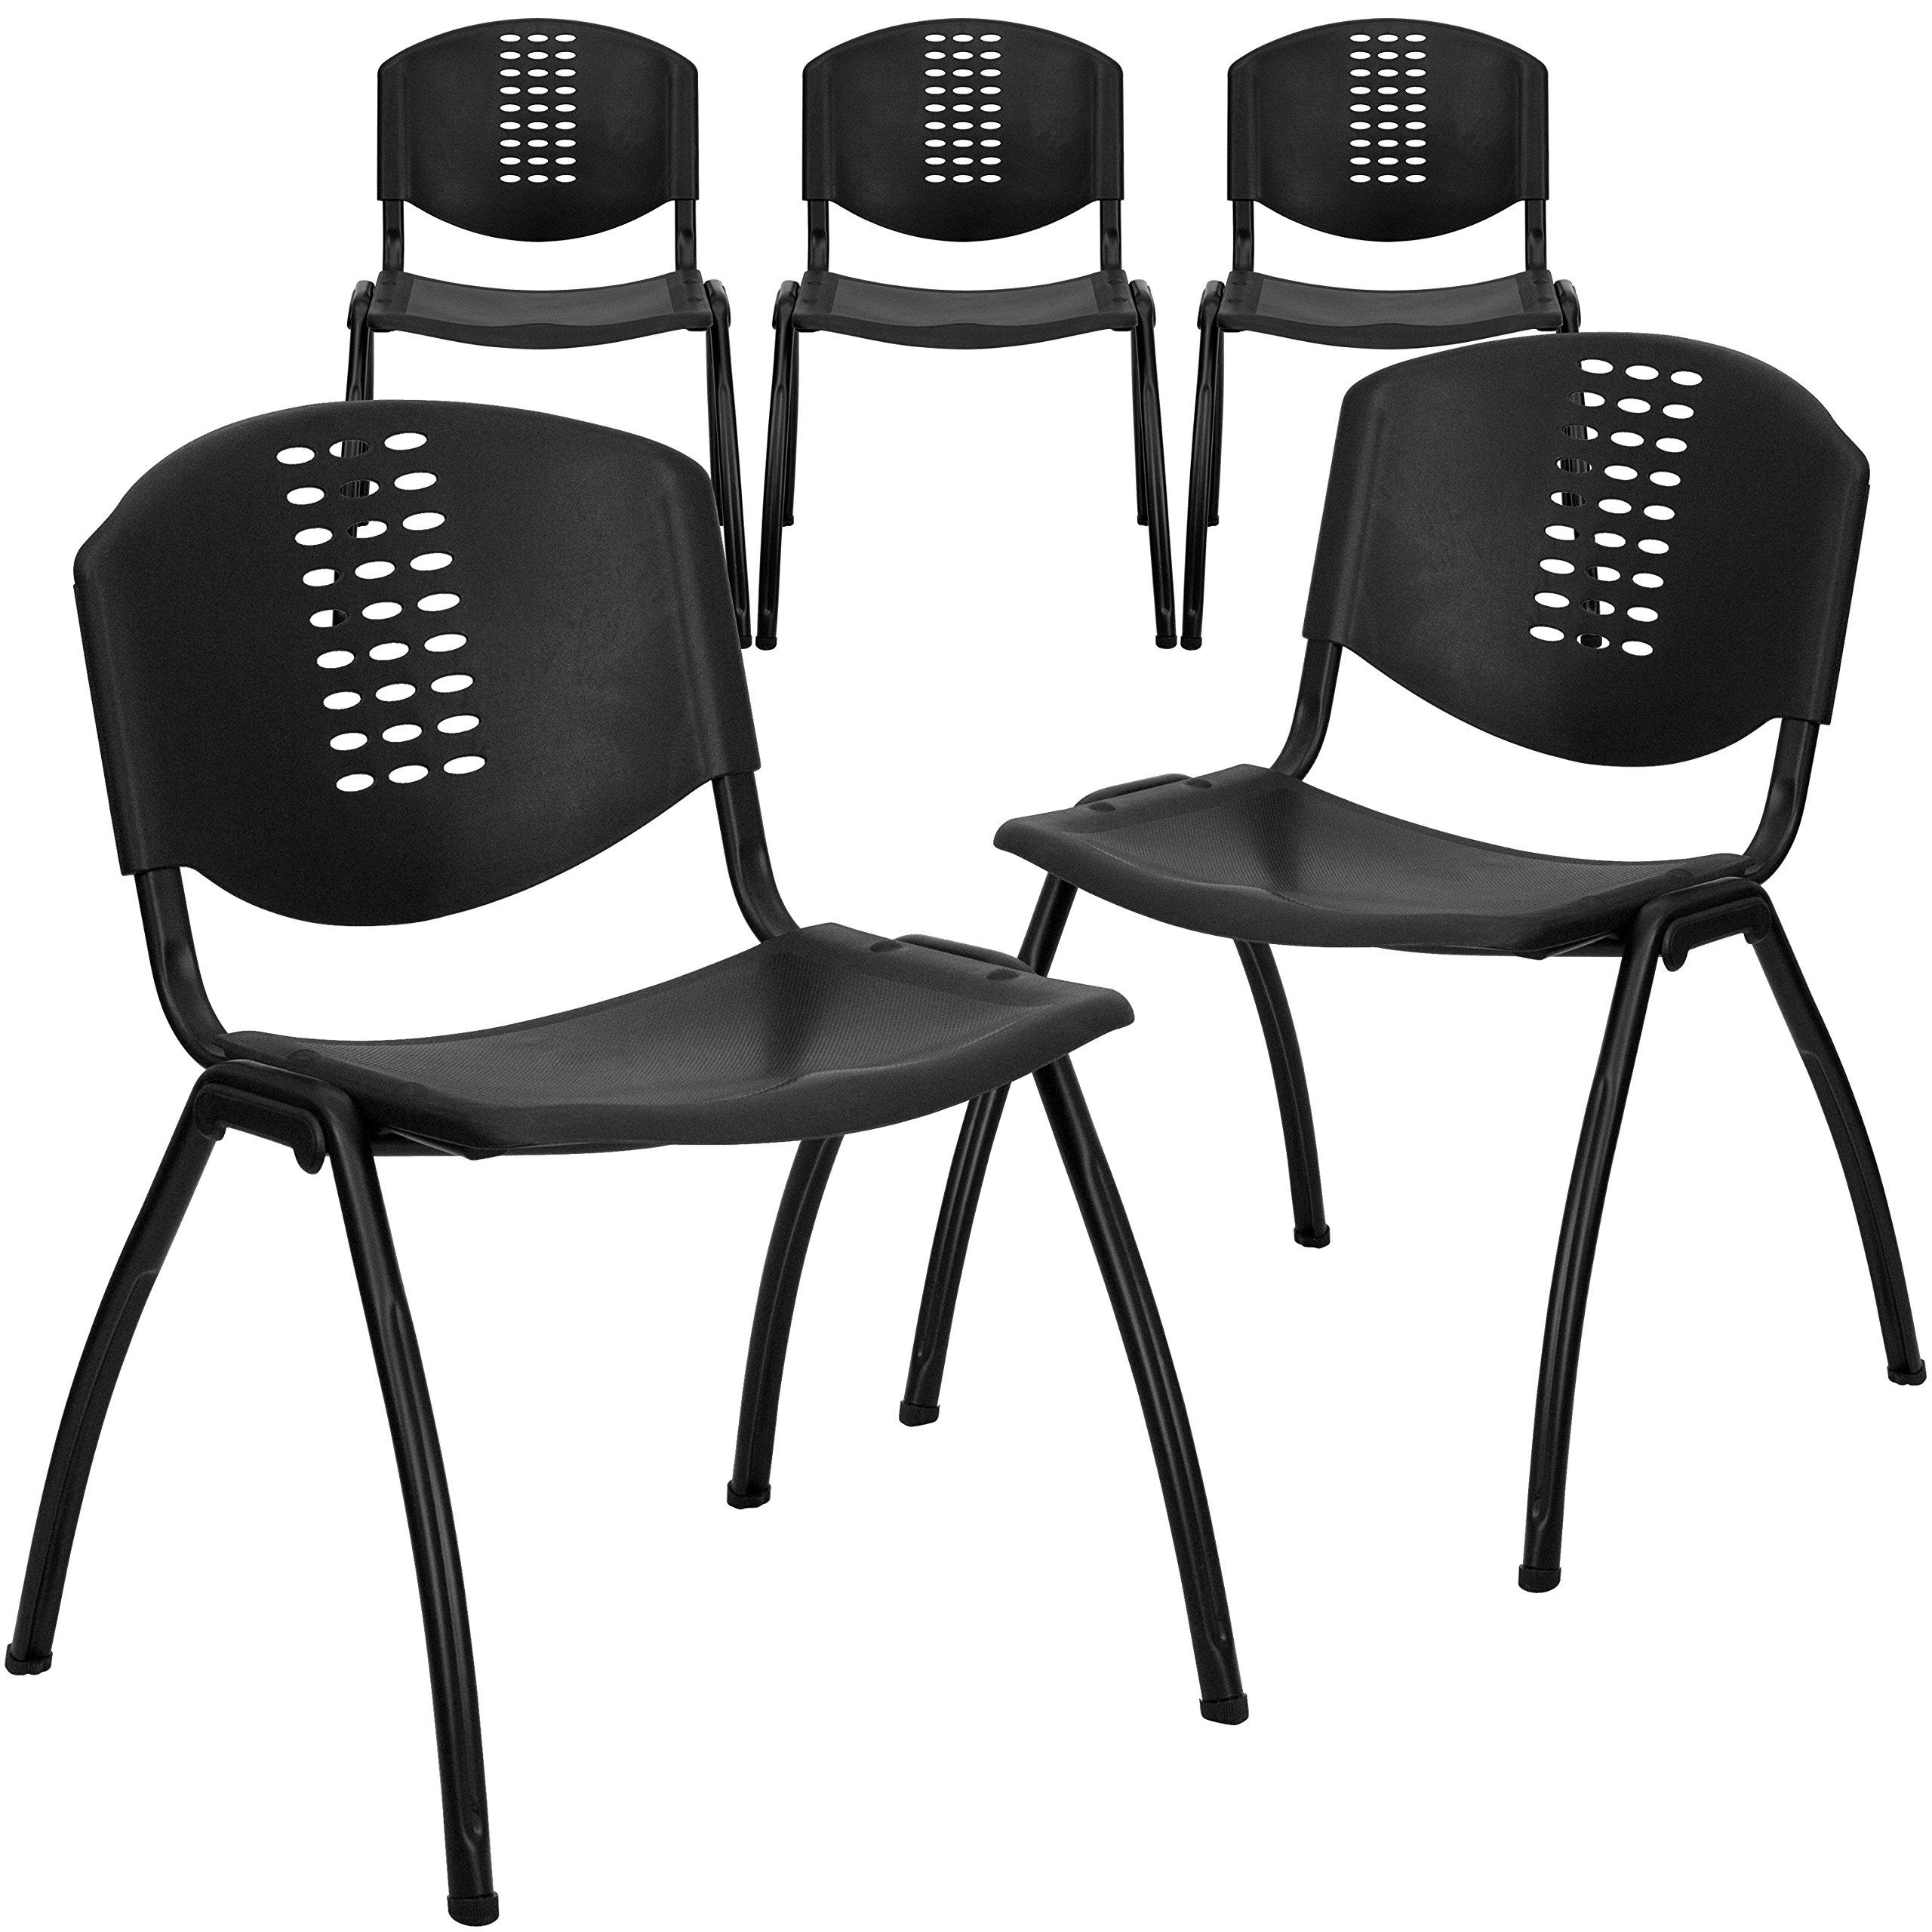 Flash Furniture 5 Pk. HERCULES Series 880 lb. Capacity Black Plastic Stack Chair with Black Frame